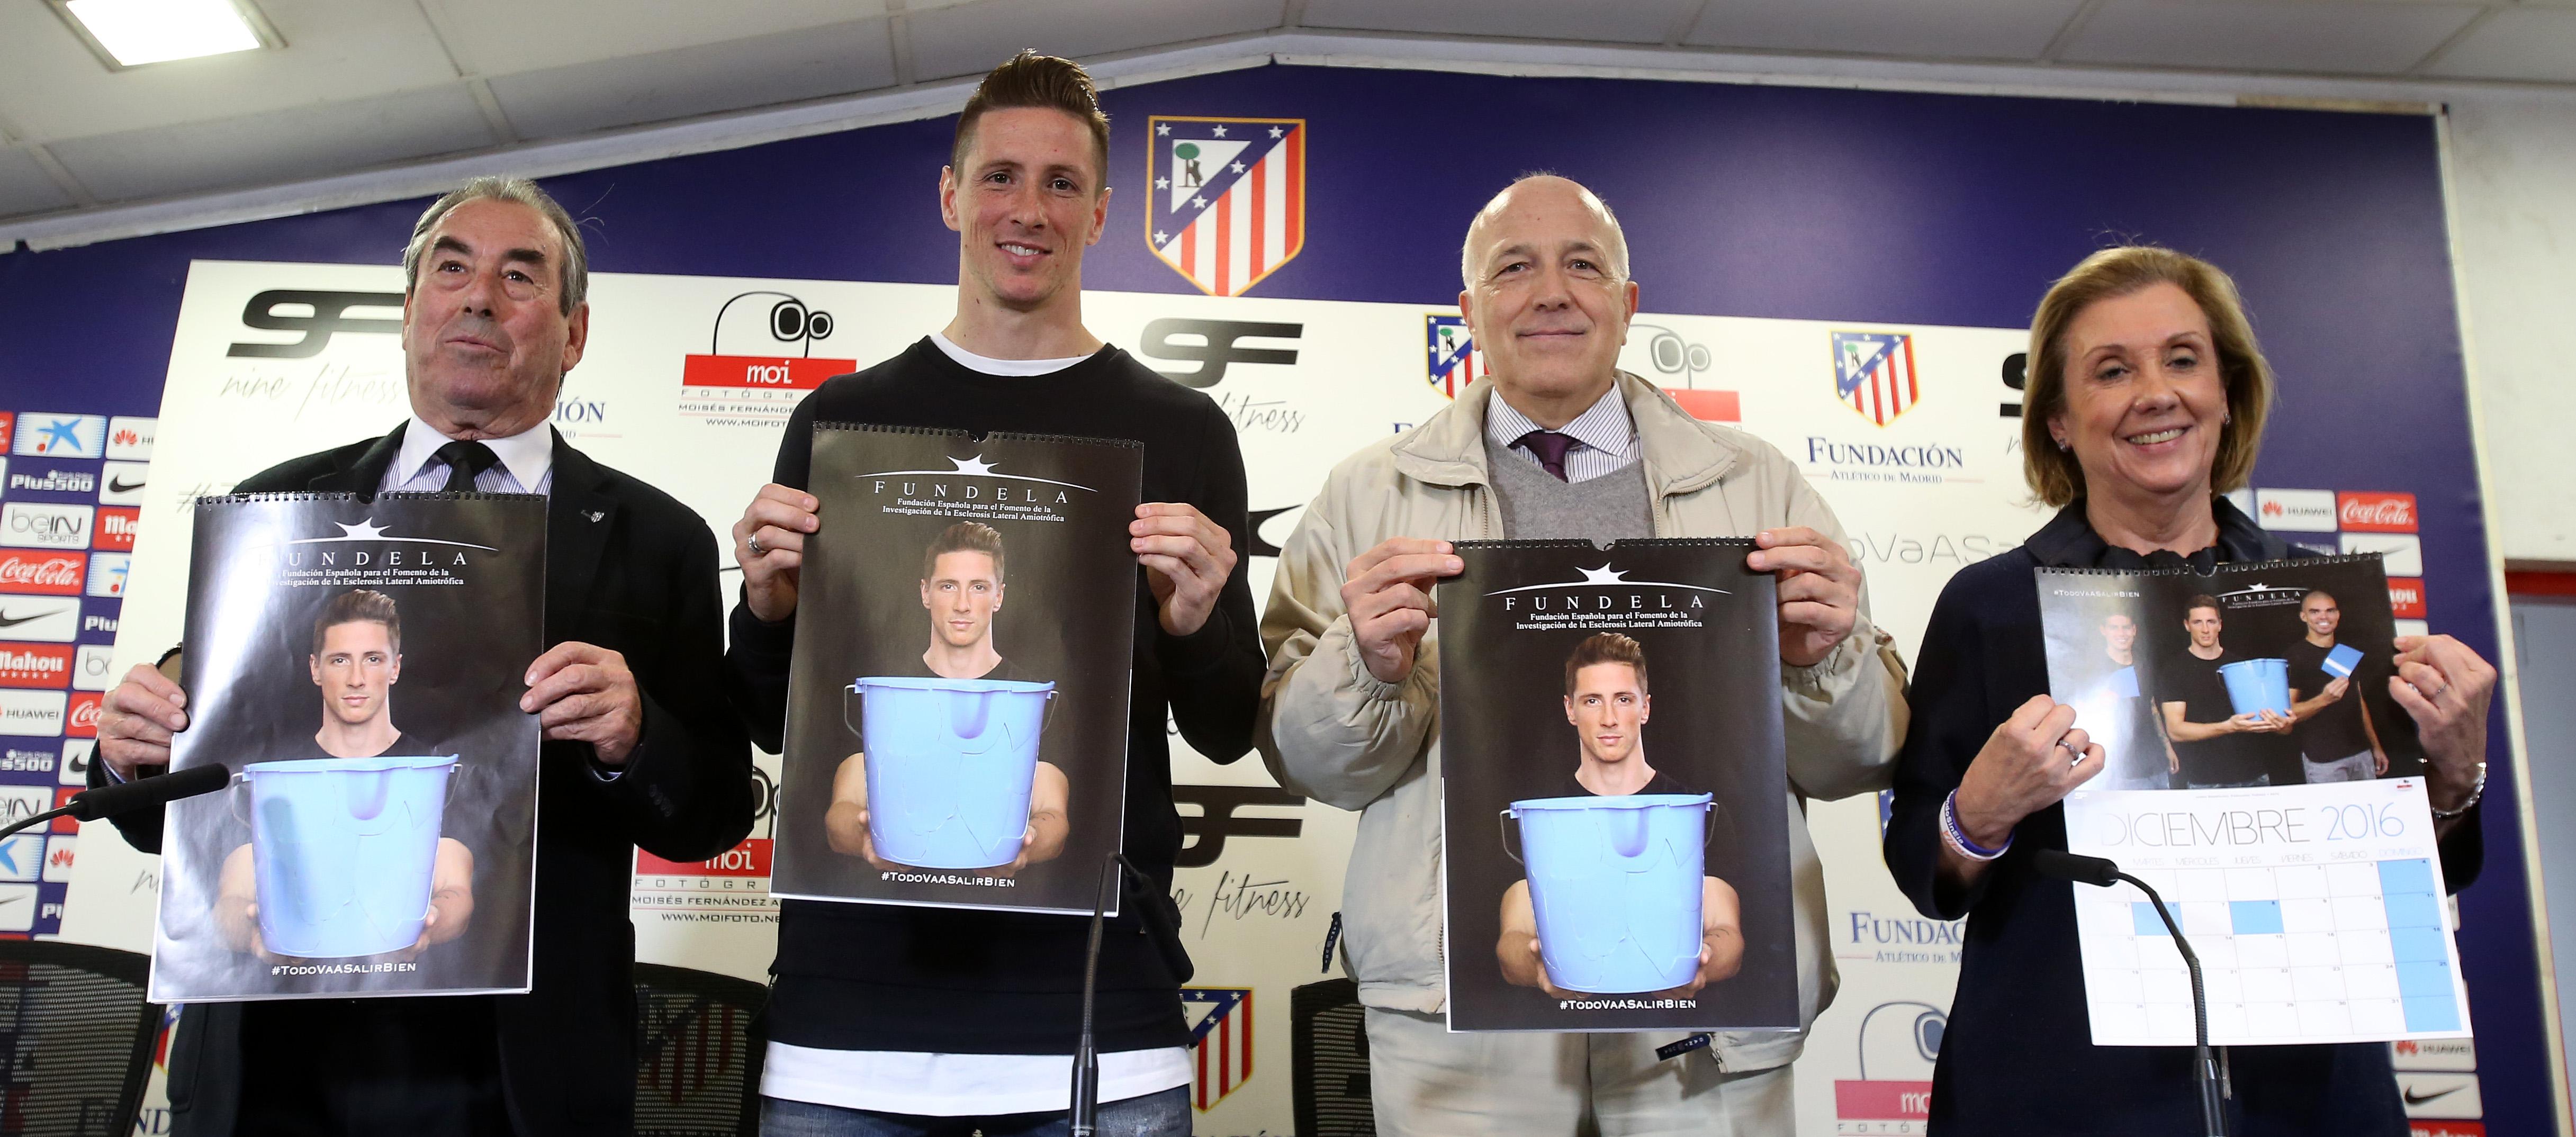 Calendario Atletico Madrid.Fernando Torres Presents A 2016 Calendar To Raise Funds For